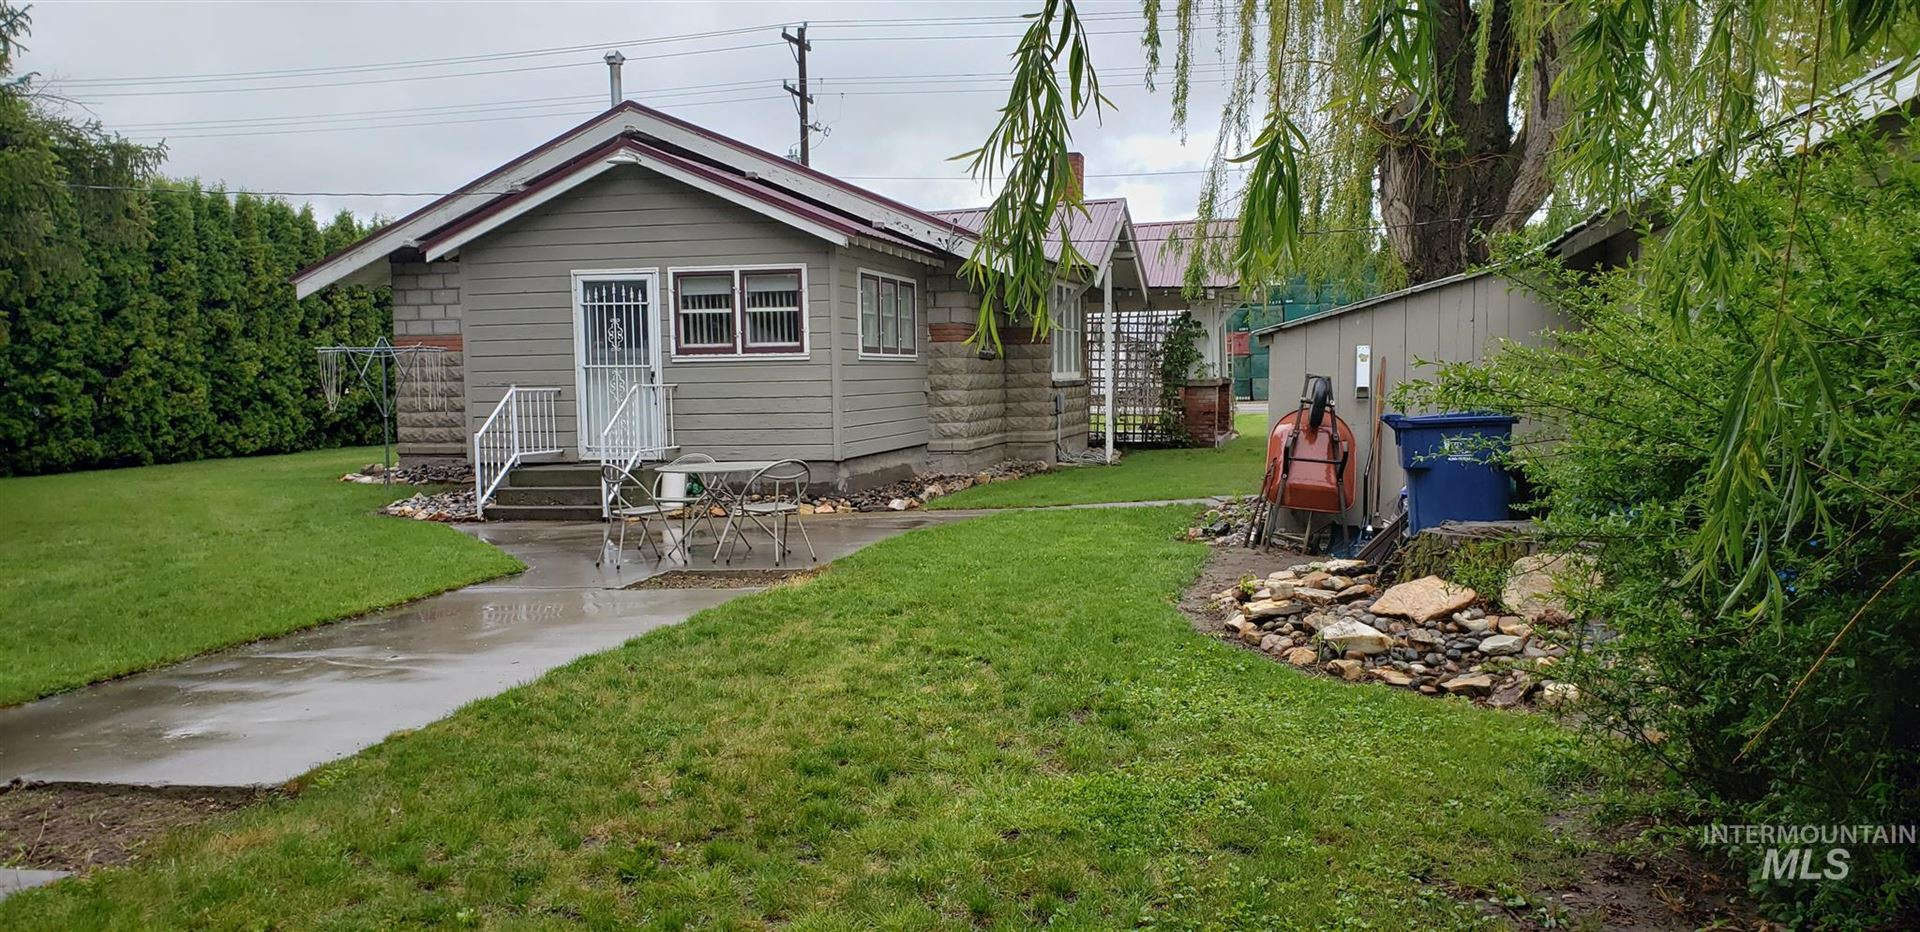 Photo of 119 Read Ave, Rupert, ID 83350 (MLS # 98767891)